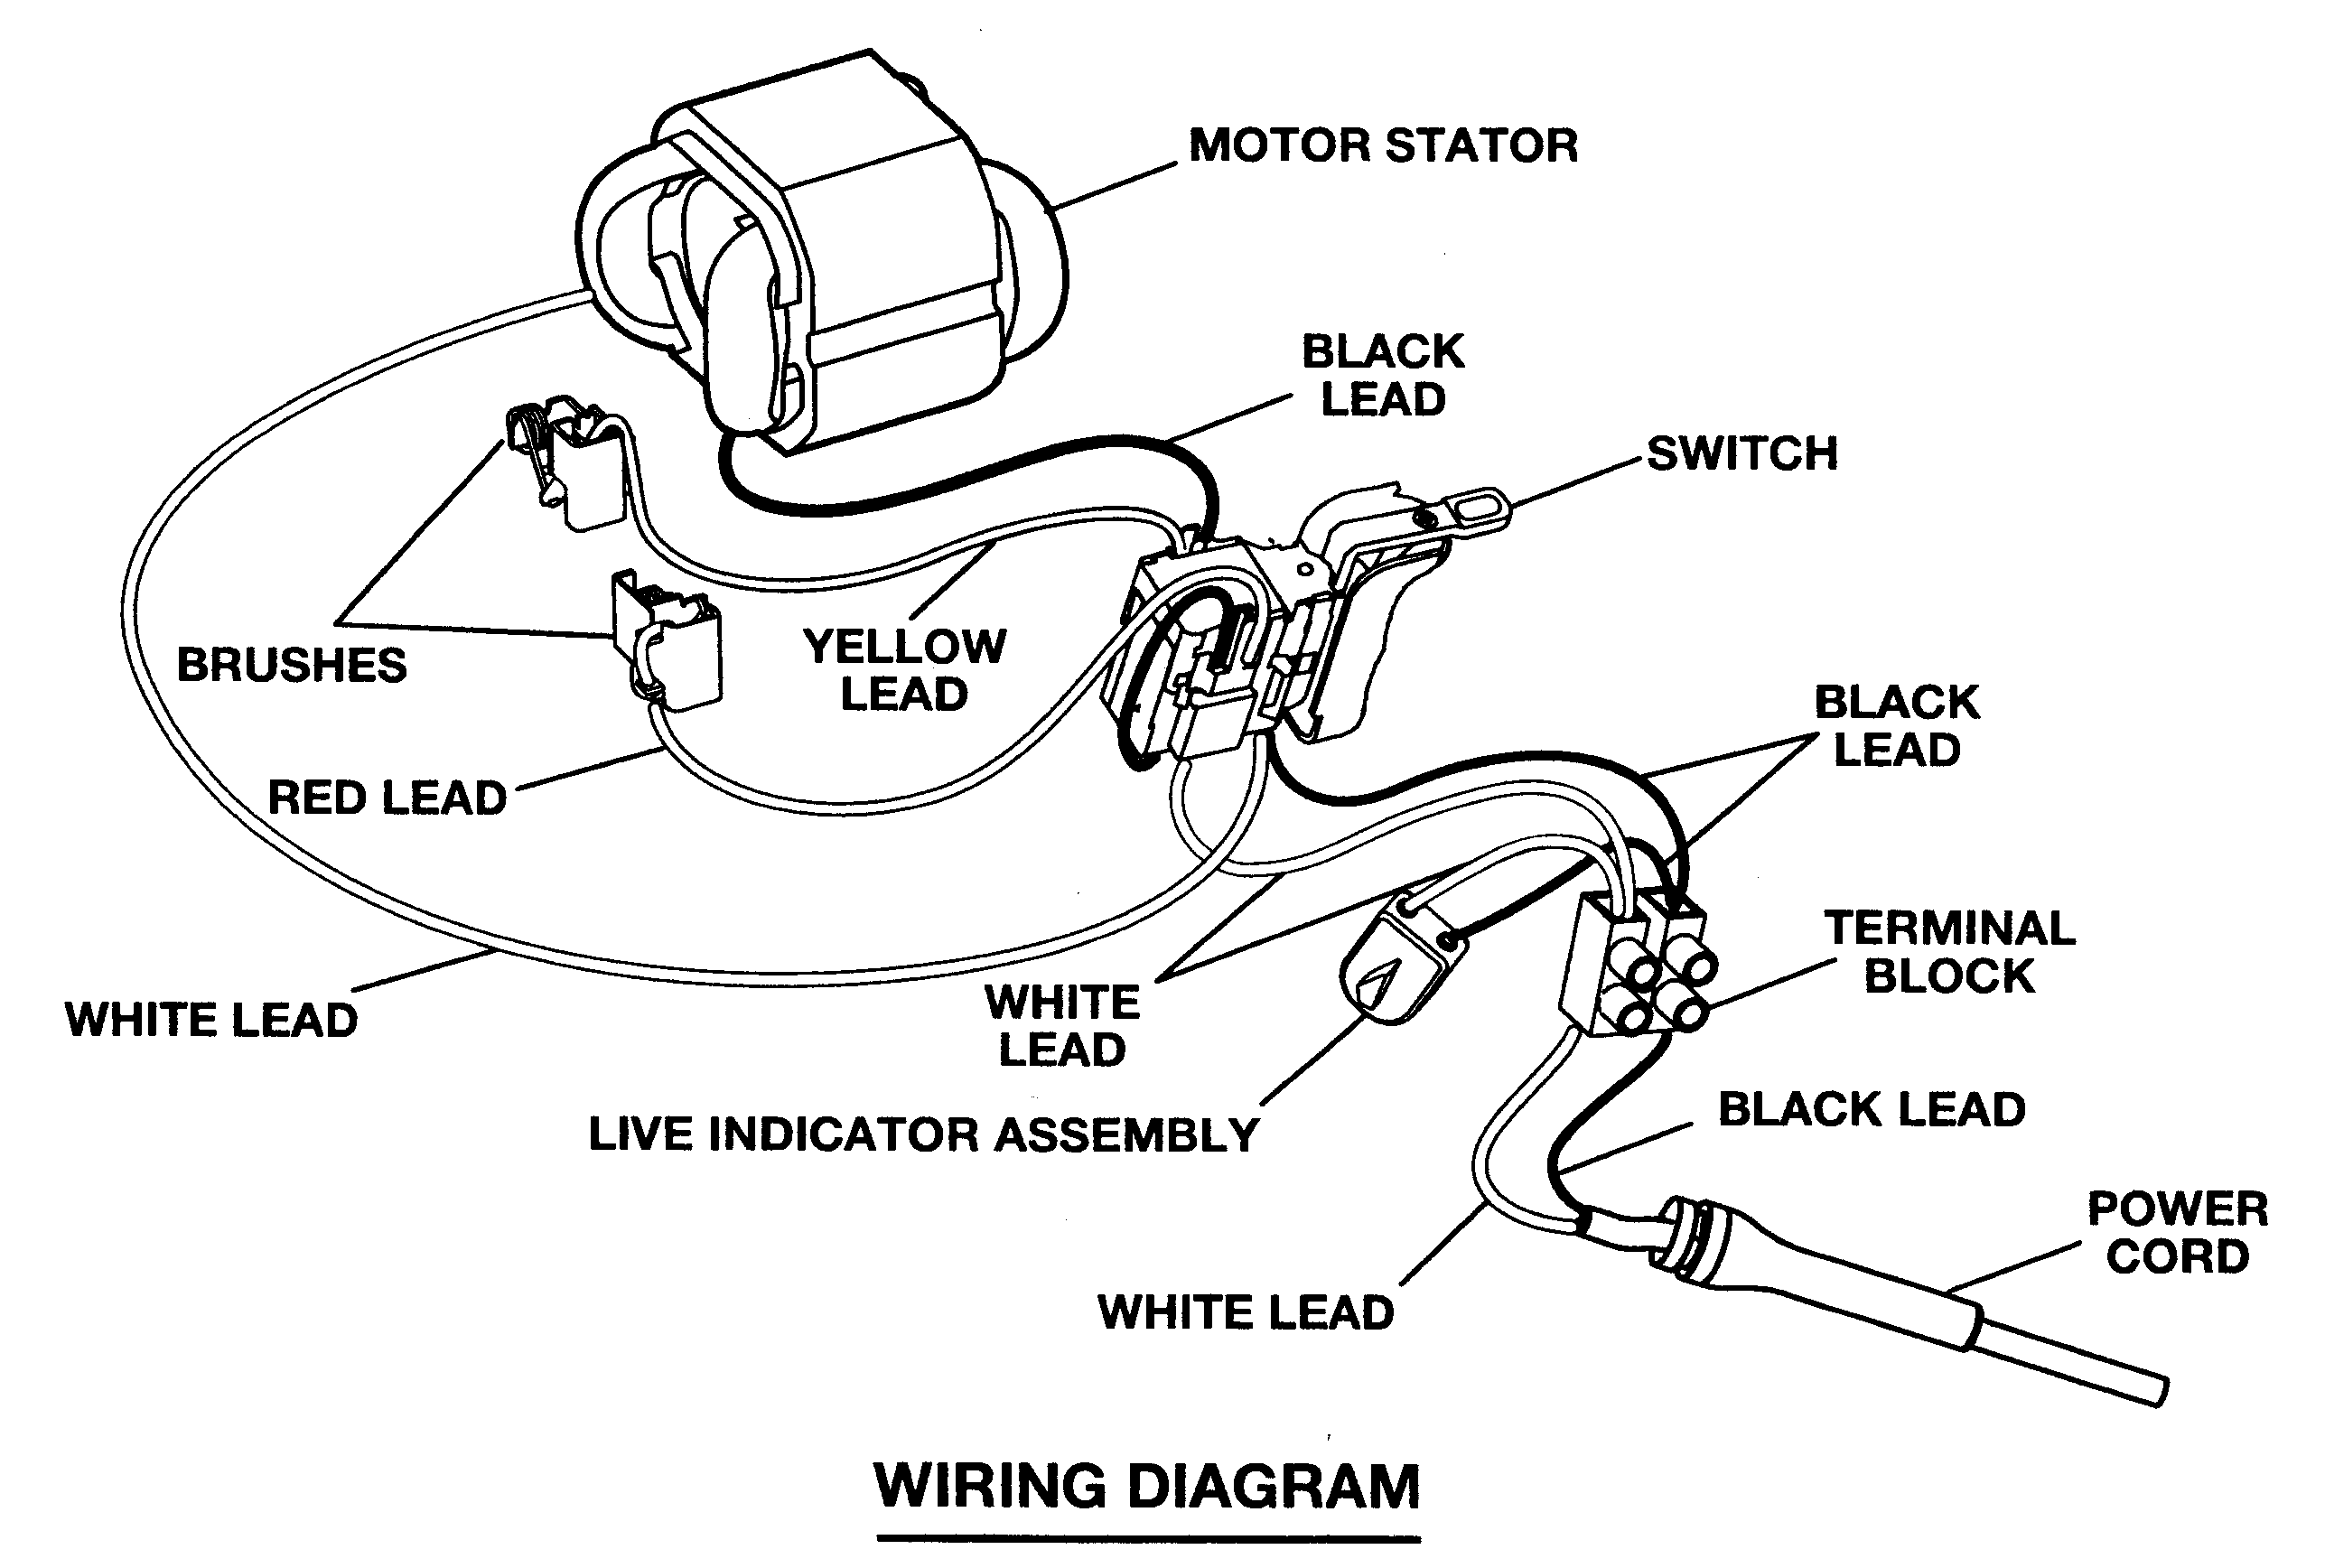 Wiring Diagrams For Power Tools - 64 C10 Under Dash Wiring Diagram -  schematics-source.pas-sayange.jeanjaures37.fr   Wiring Schematics Power Tools      Wiring Diagram Resource